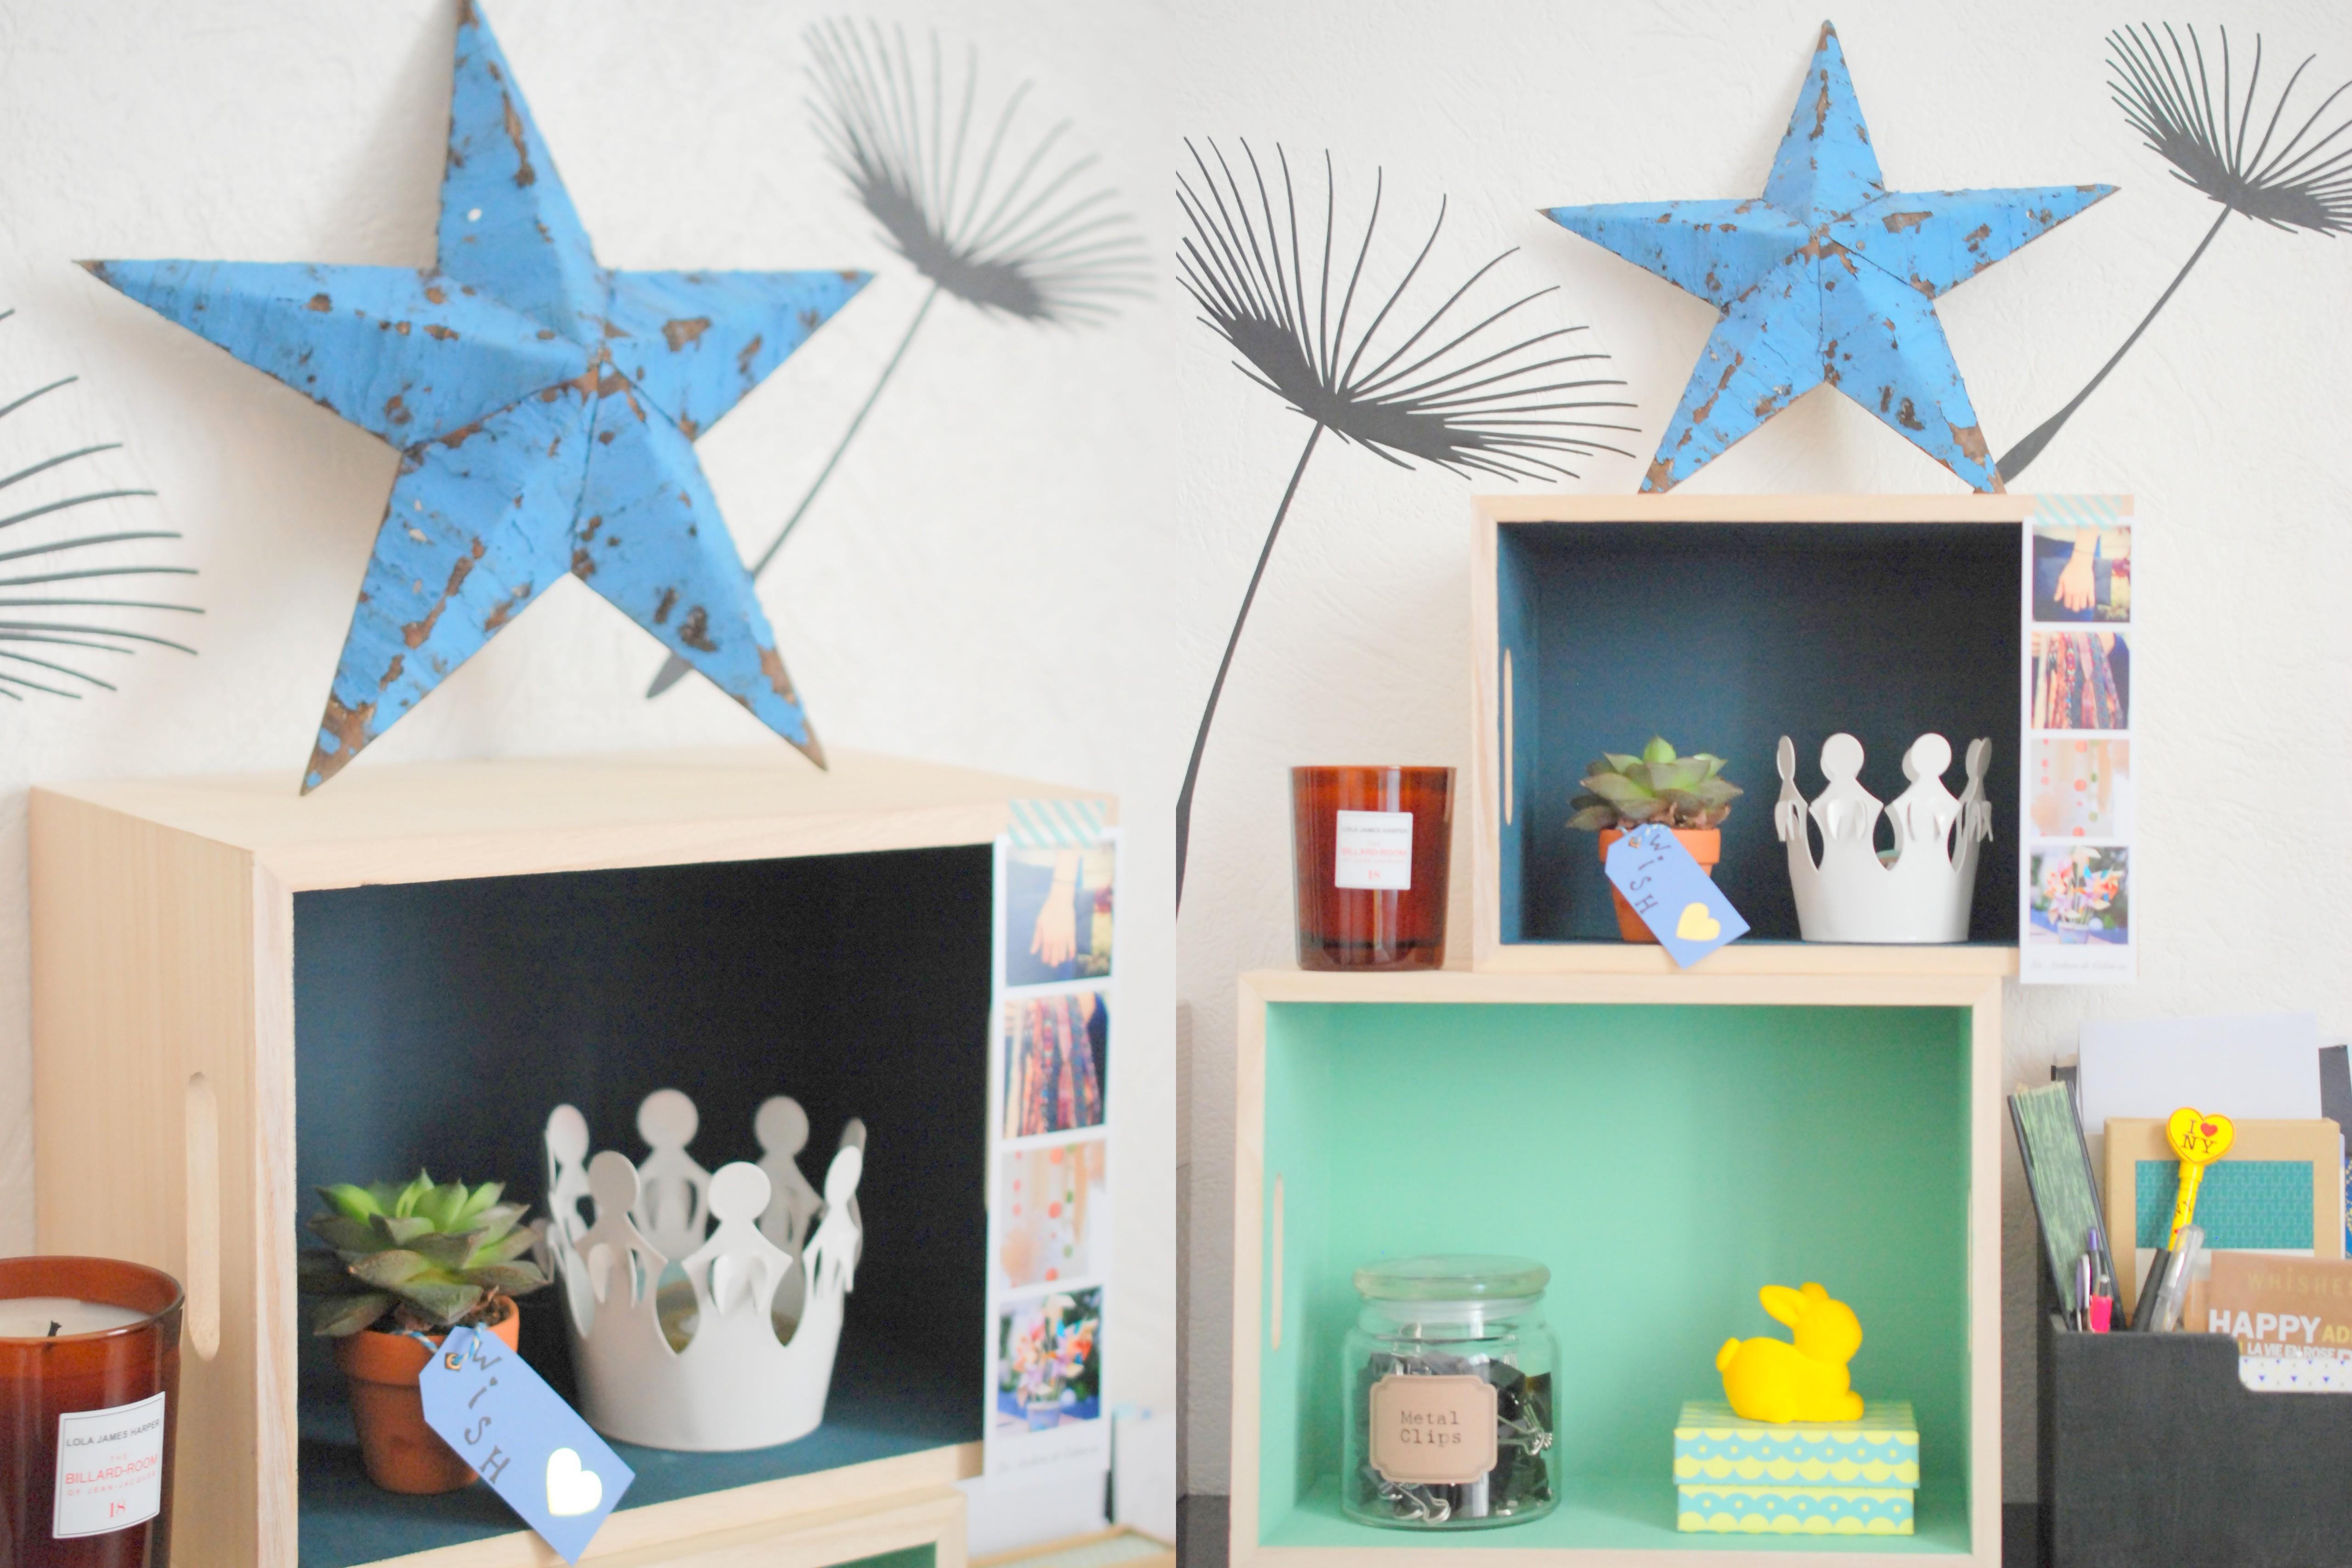 celestin bons plans mode beaut gourmands strasbourg diy d co avec farrow ball. Black Bedroom Furniture Sets. Home Design Ideas